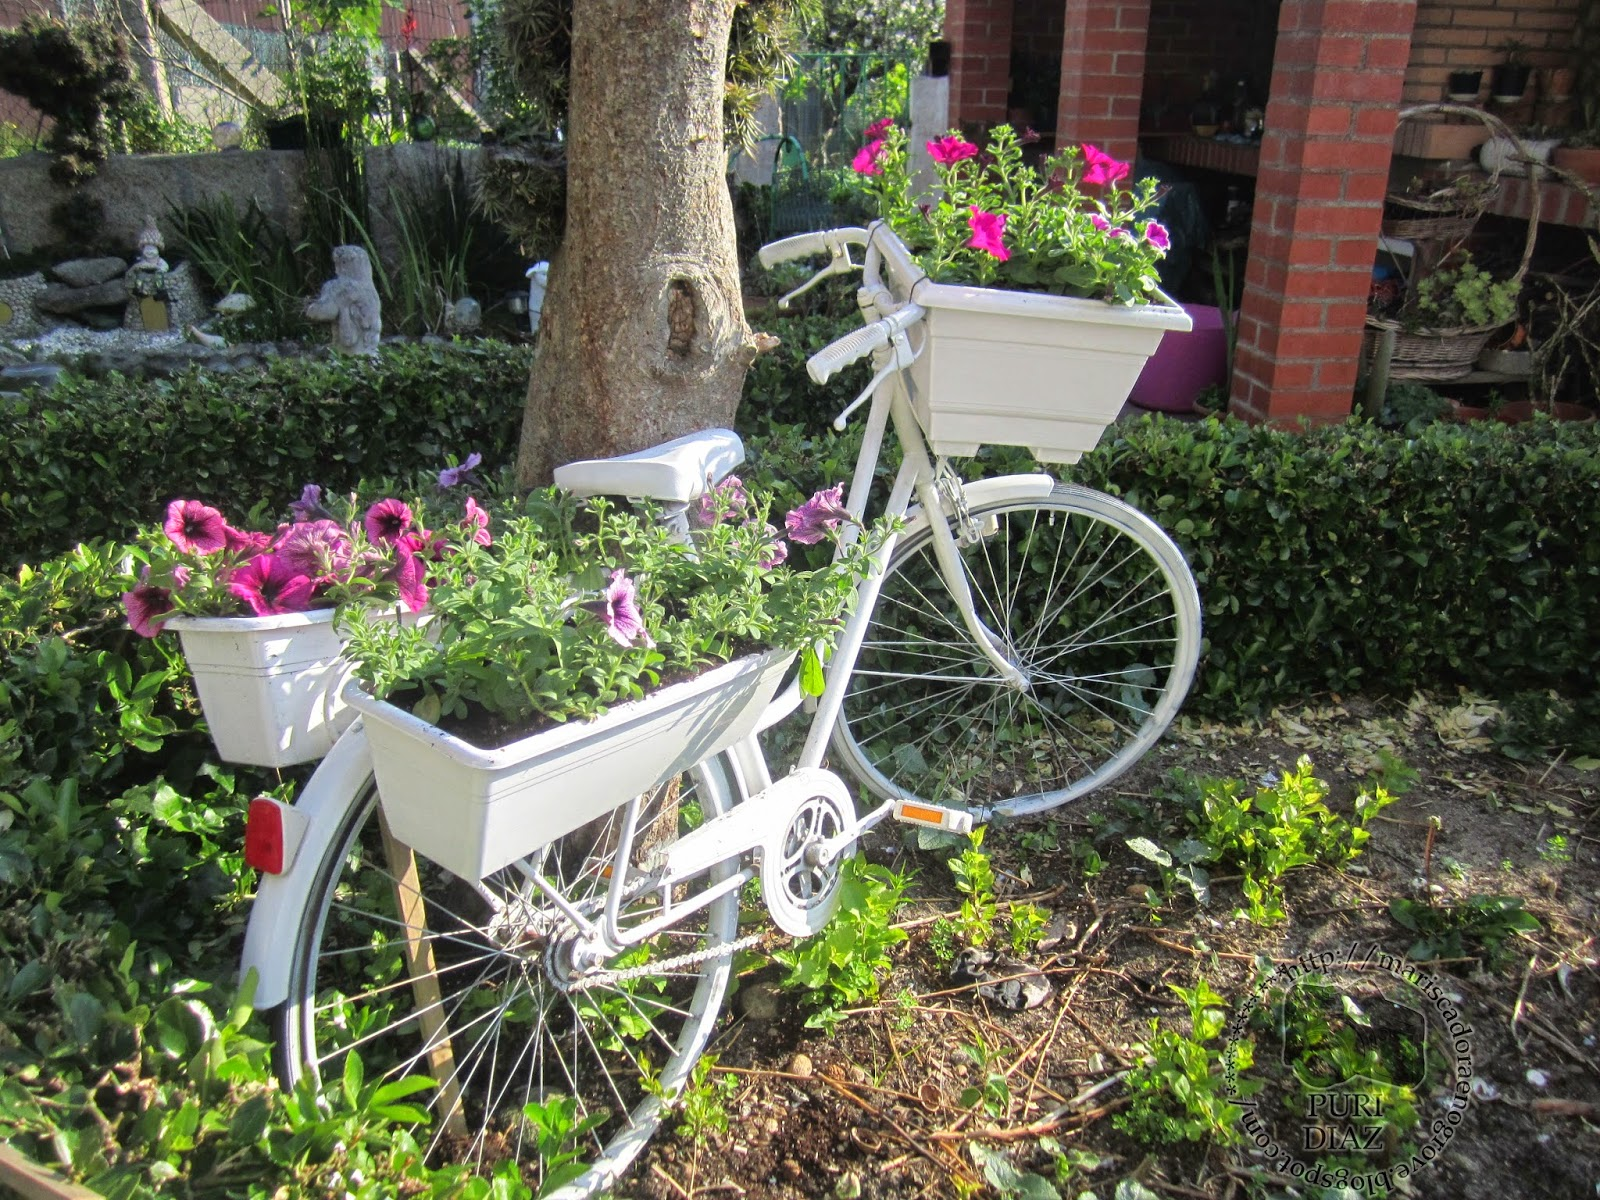 Manualidades puri diaz reciclar bicicleta vieja para el jardin - Decorar mi jardin ...